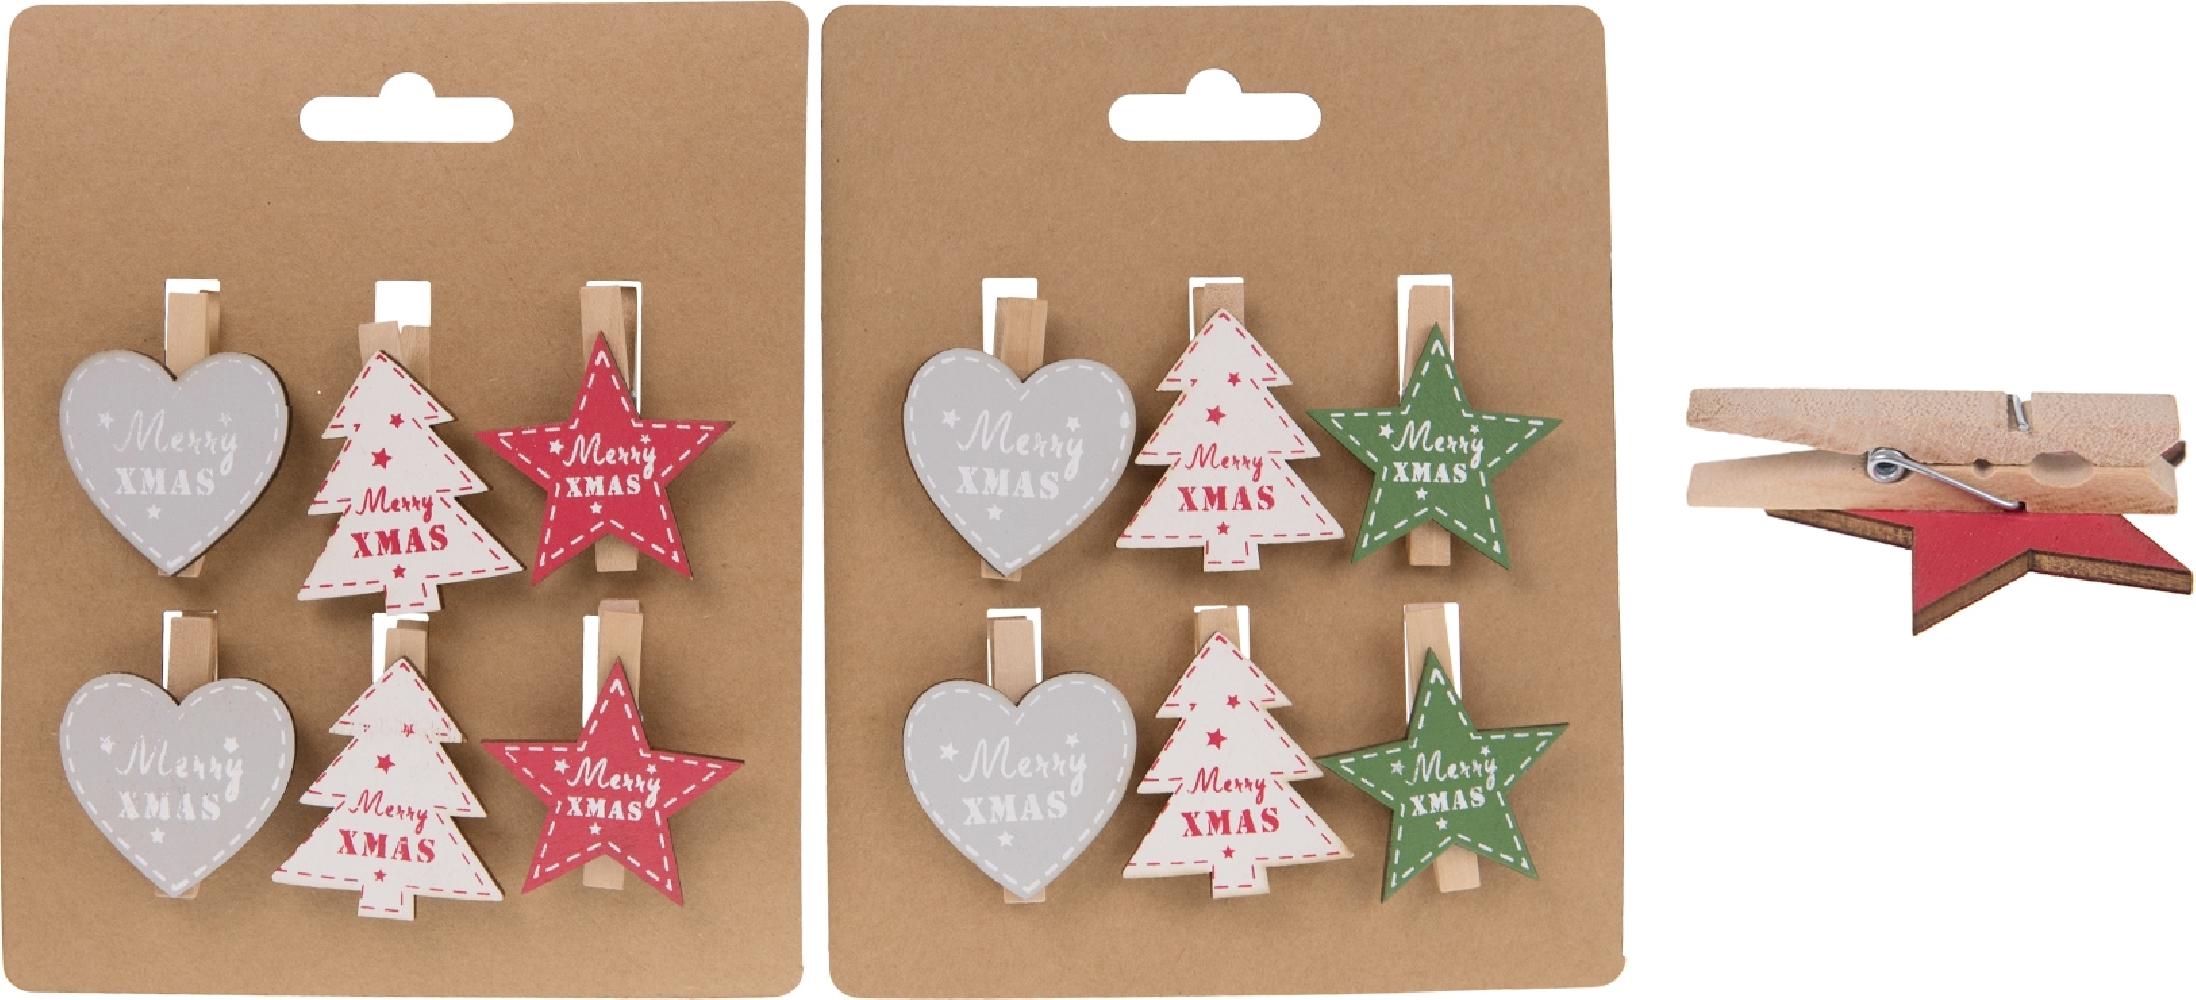 Clip natalizie in legno (6 pezzi)